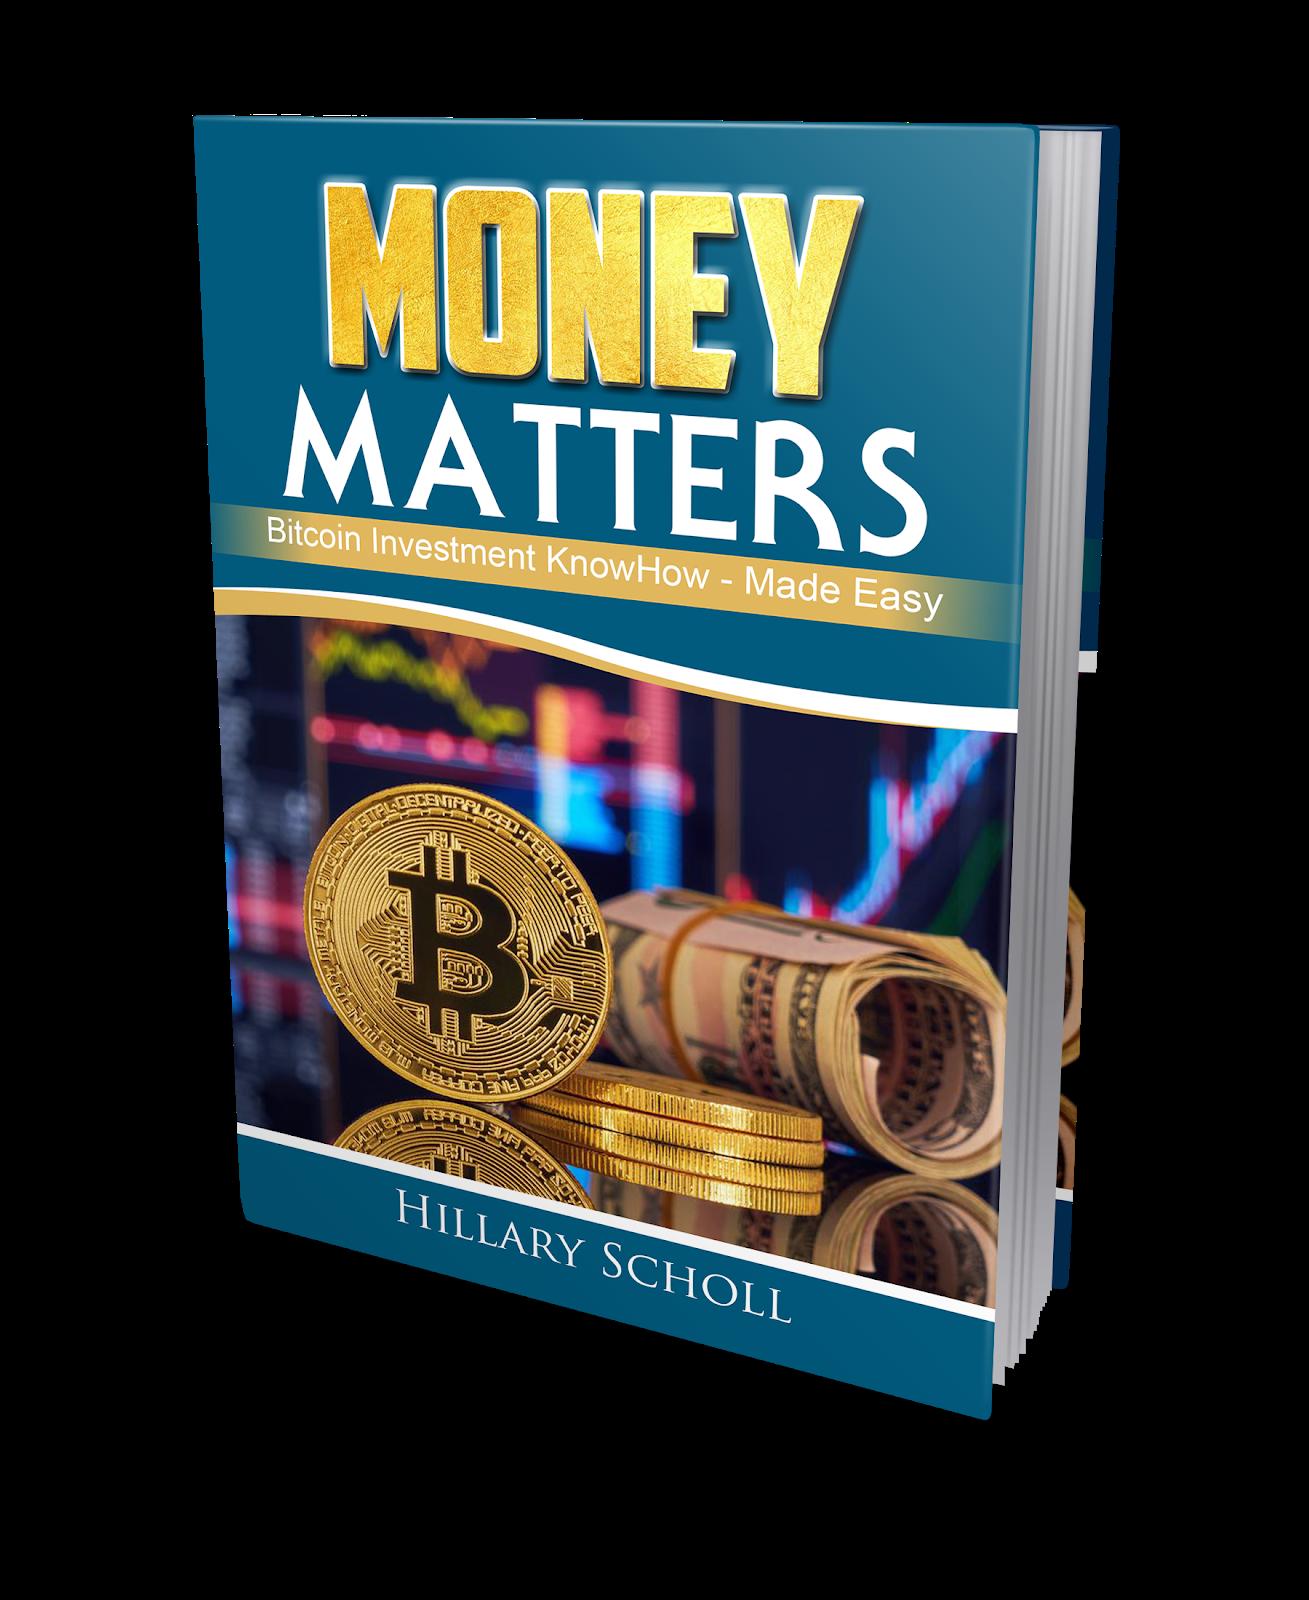 #Giveaway Money Matters - Bitcoins